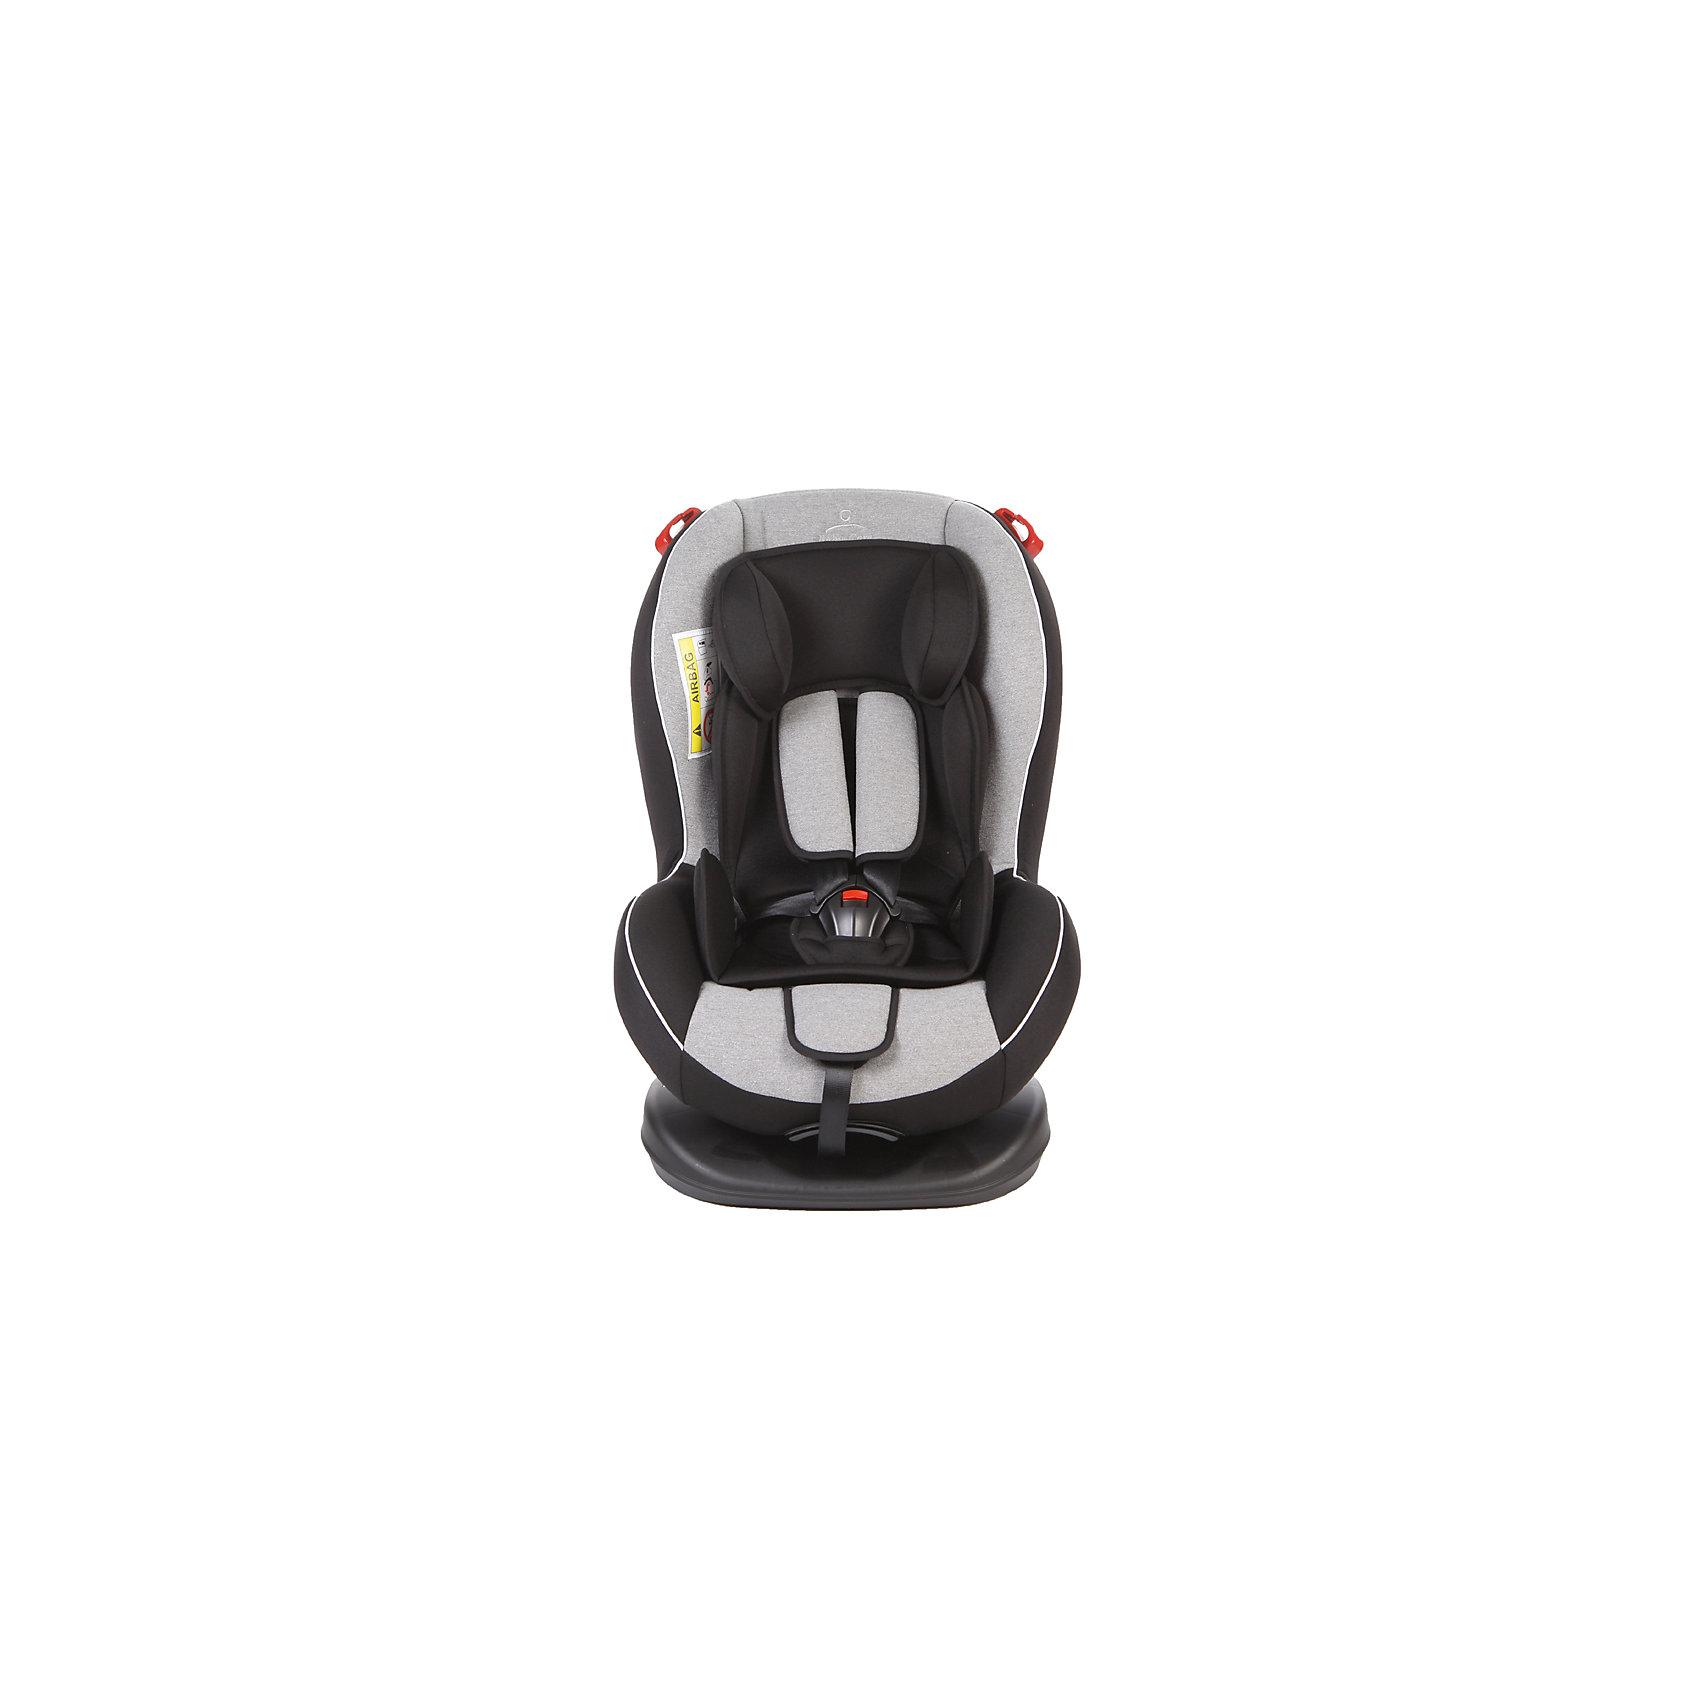 Baby Care Автокресло Basic Evolution 0-25 кг, Baby Care, серый/чёрный автокресло baby care eso basic premium темно серое